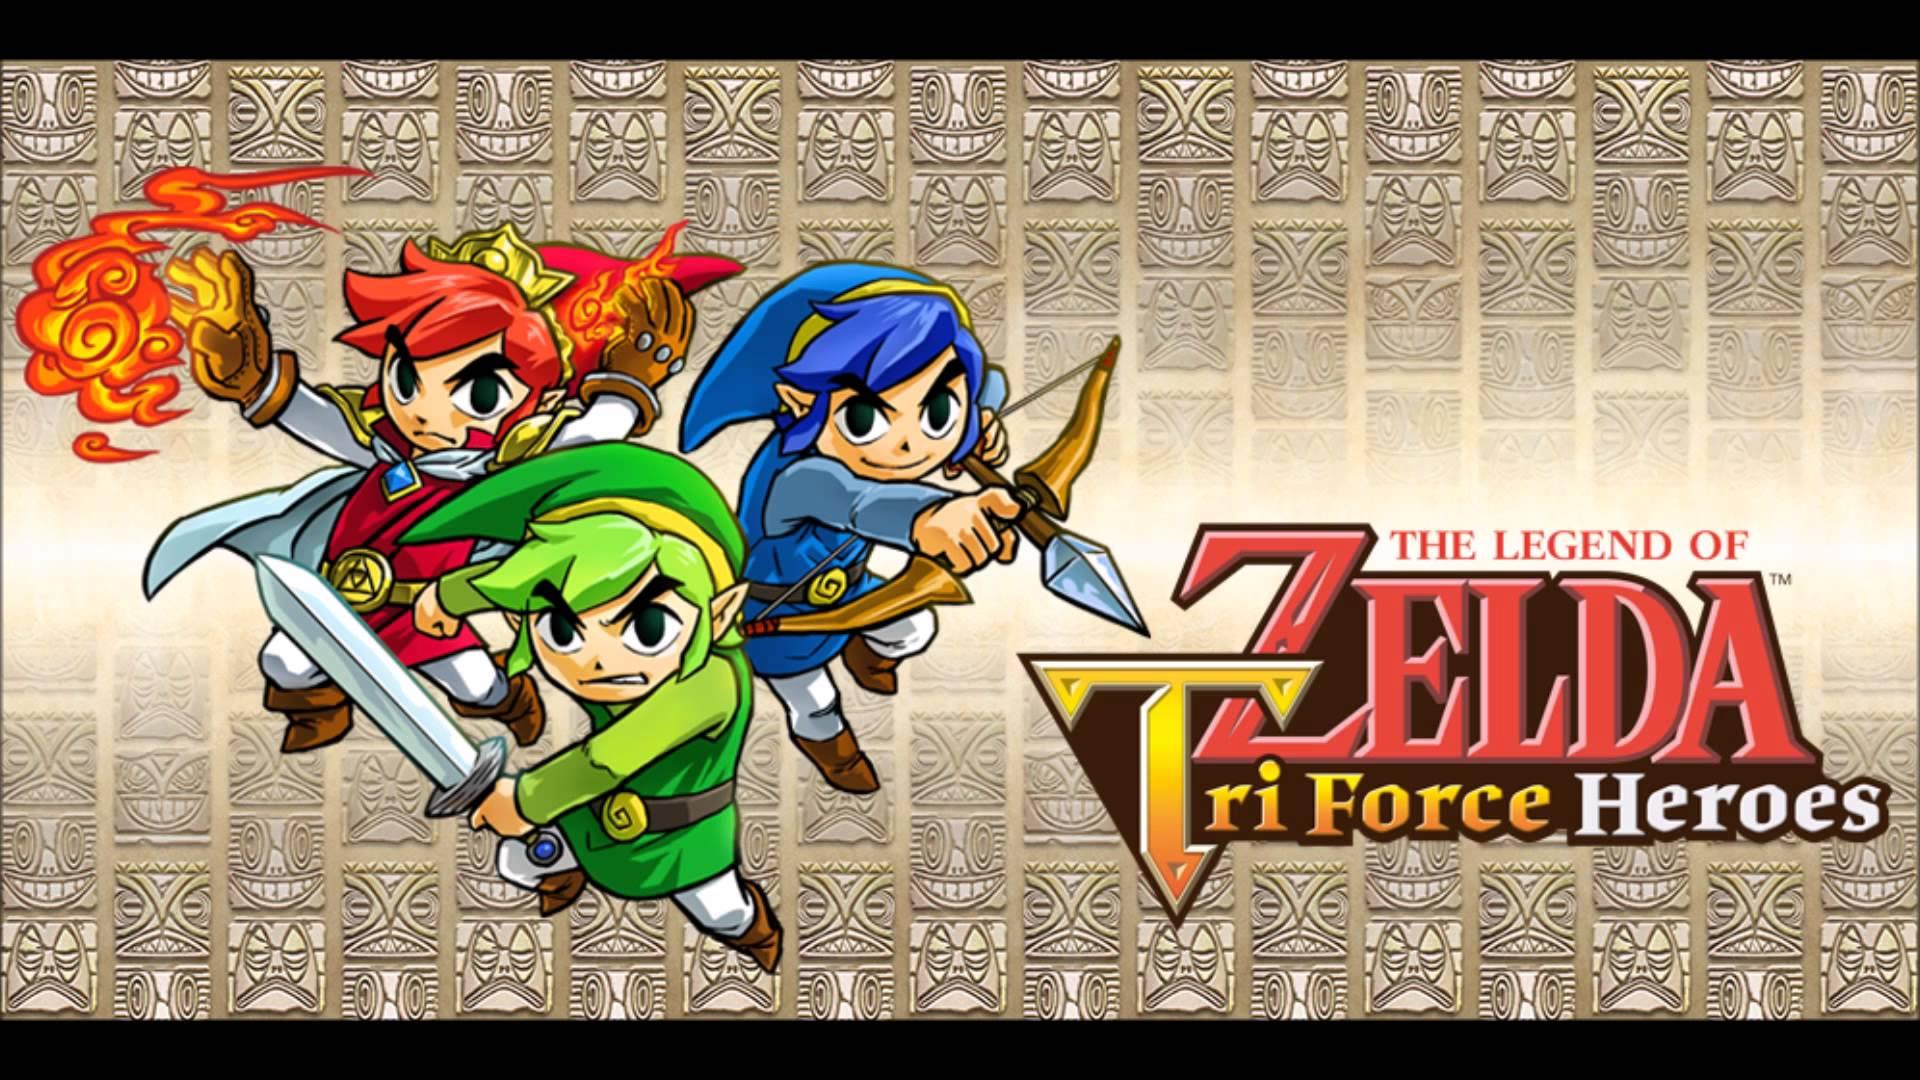 tri force heroes